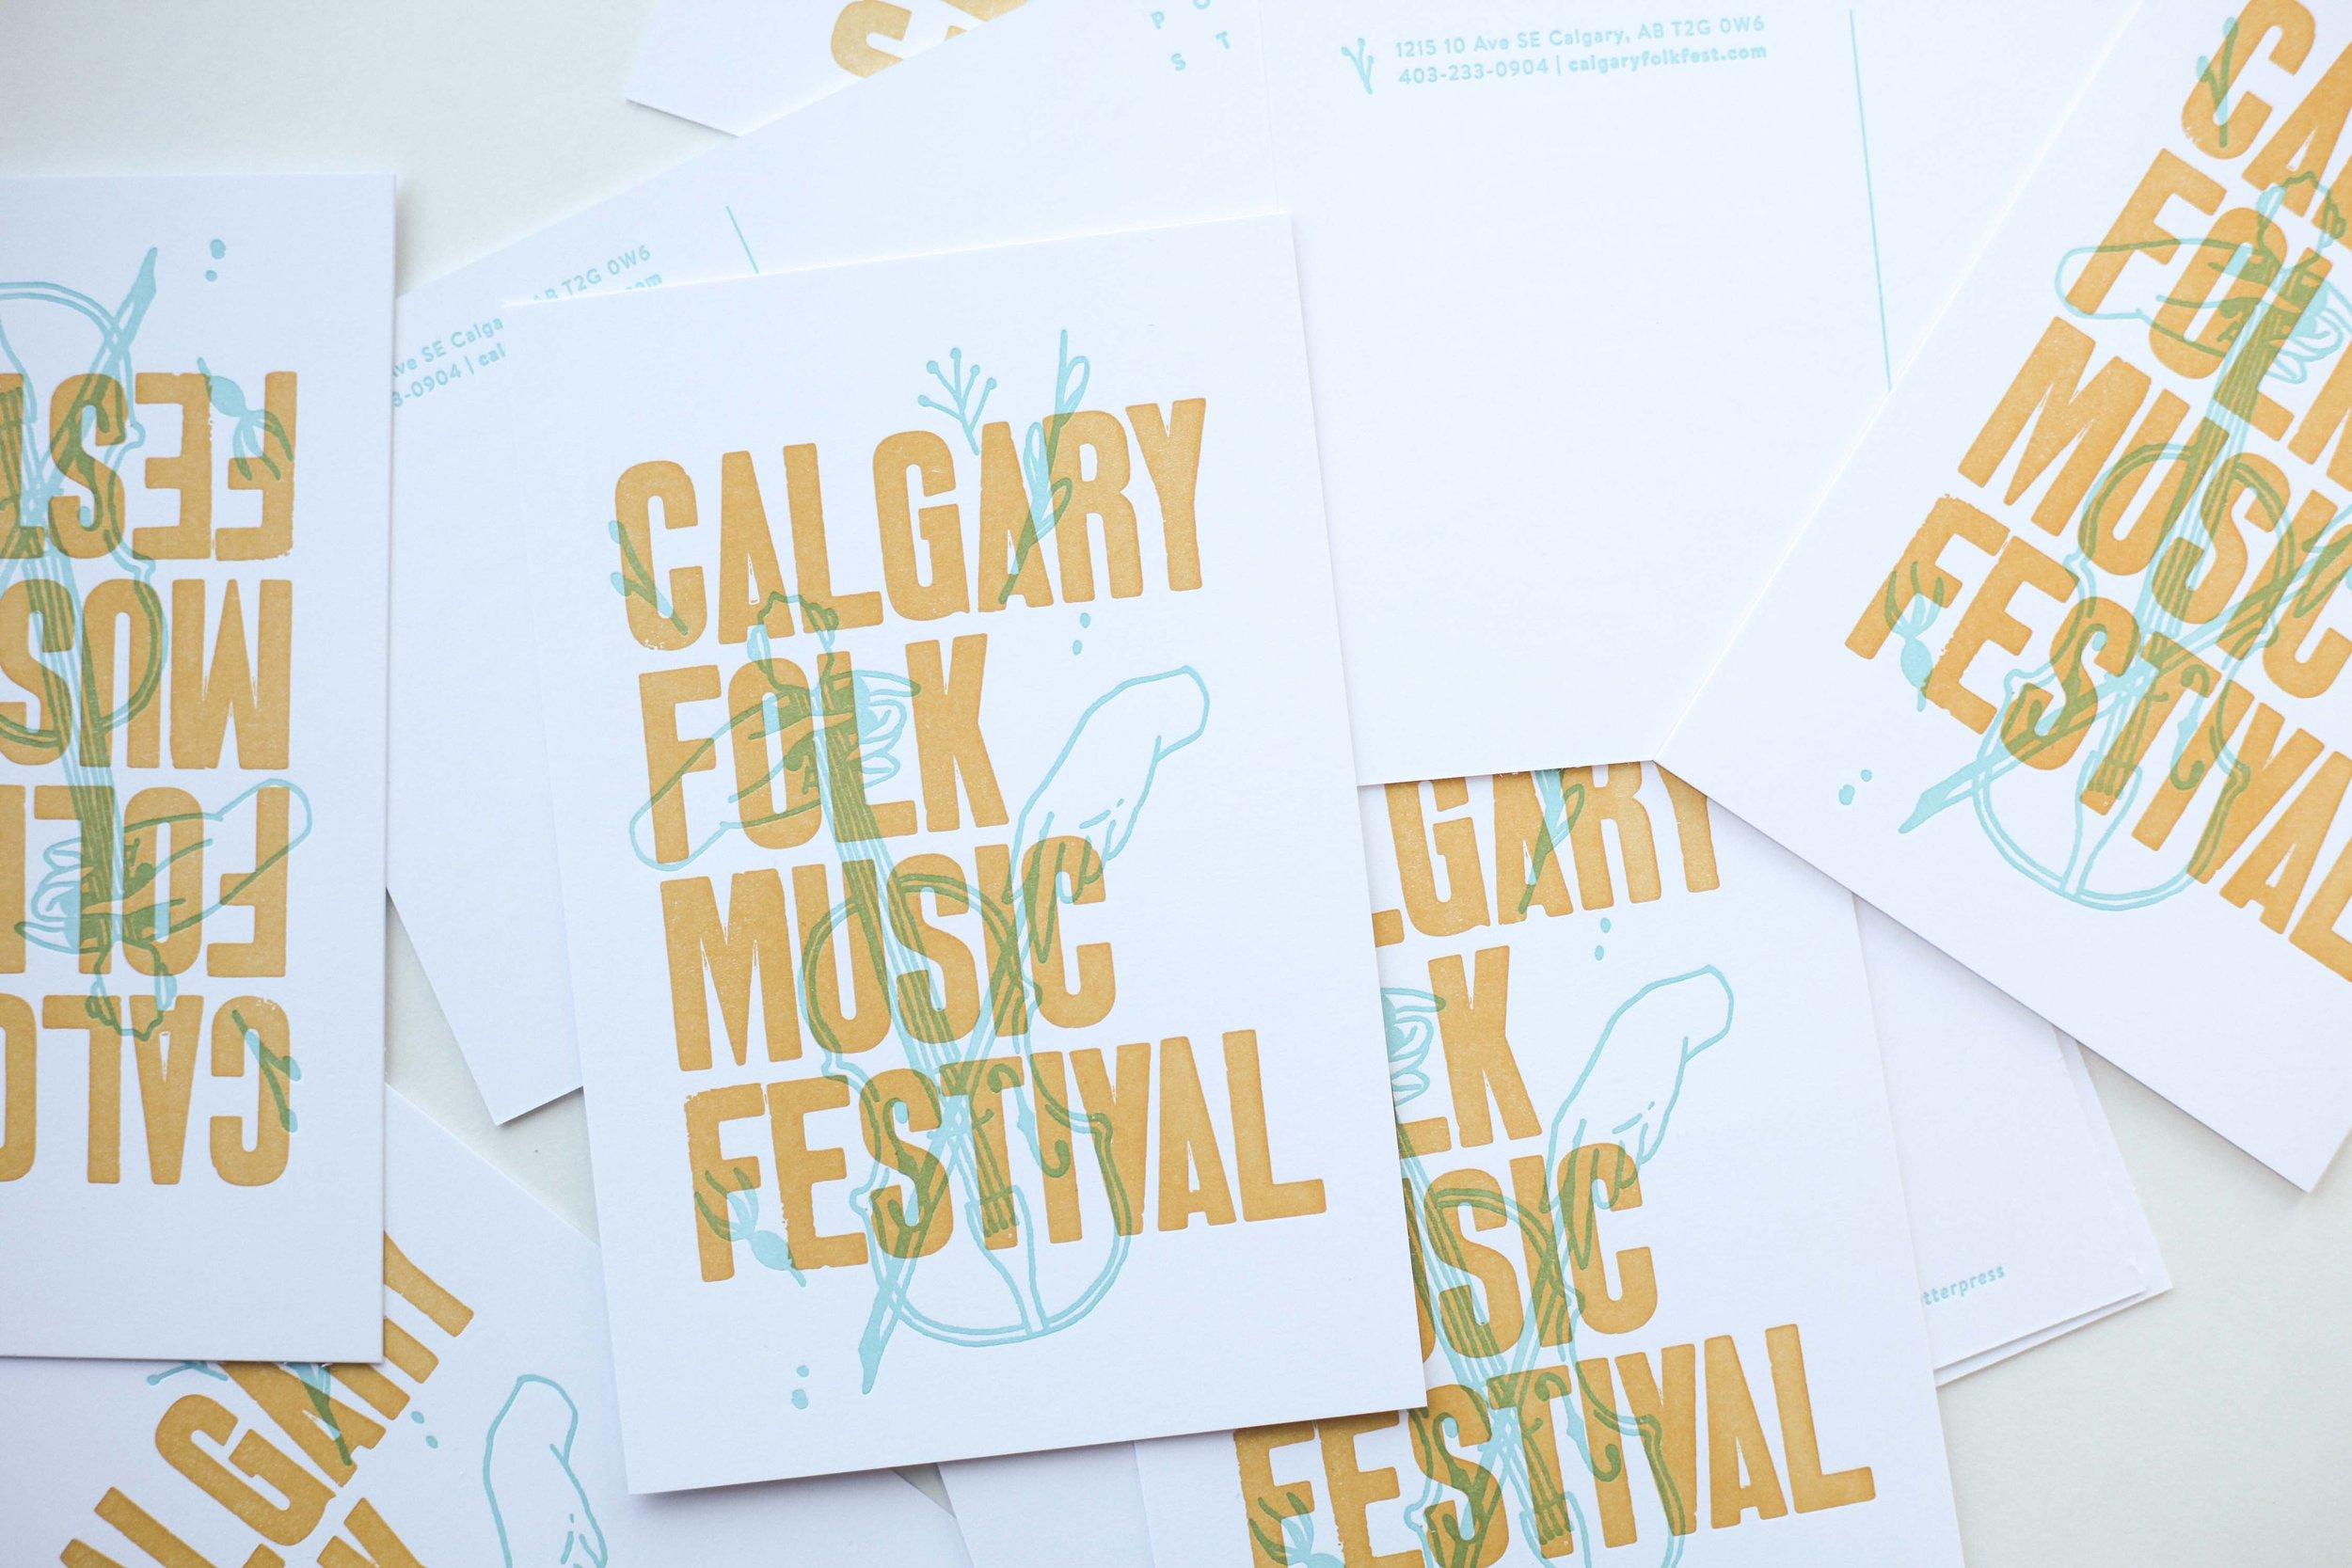 Calgary Folk Music Festival '19